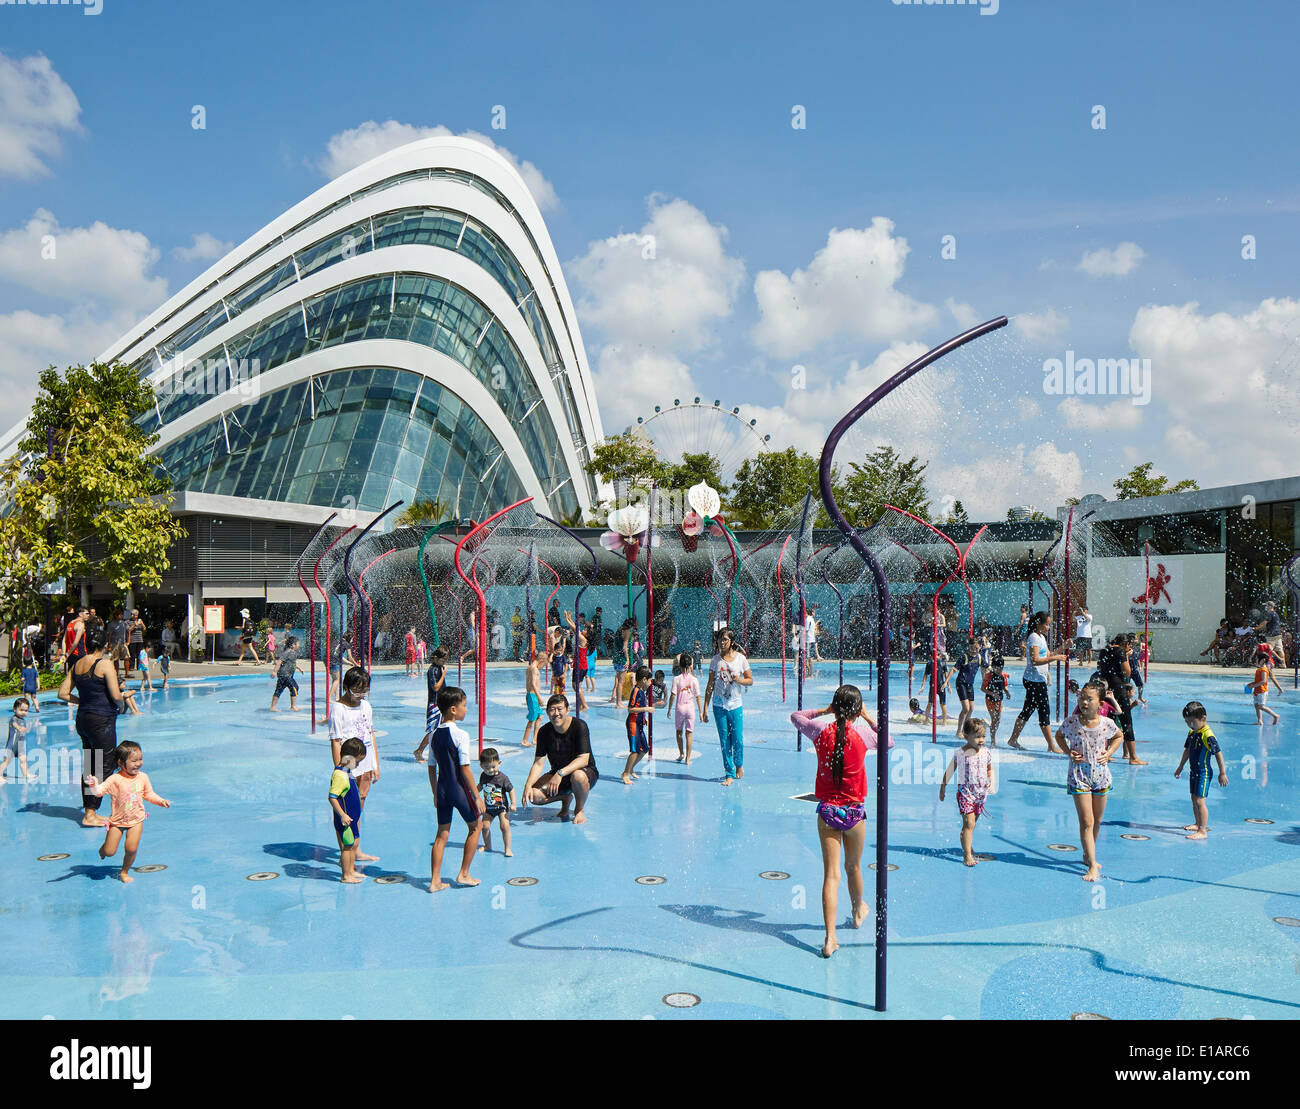 Garden By The Bay Water Park gardensthe bay, children's garden, singapore, singapore stock